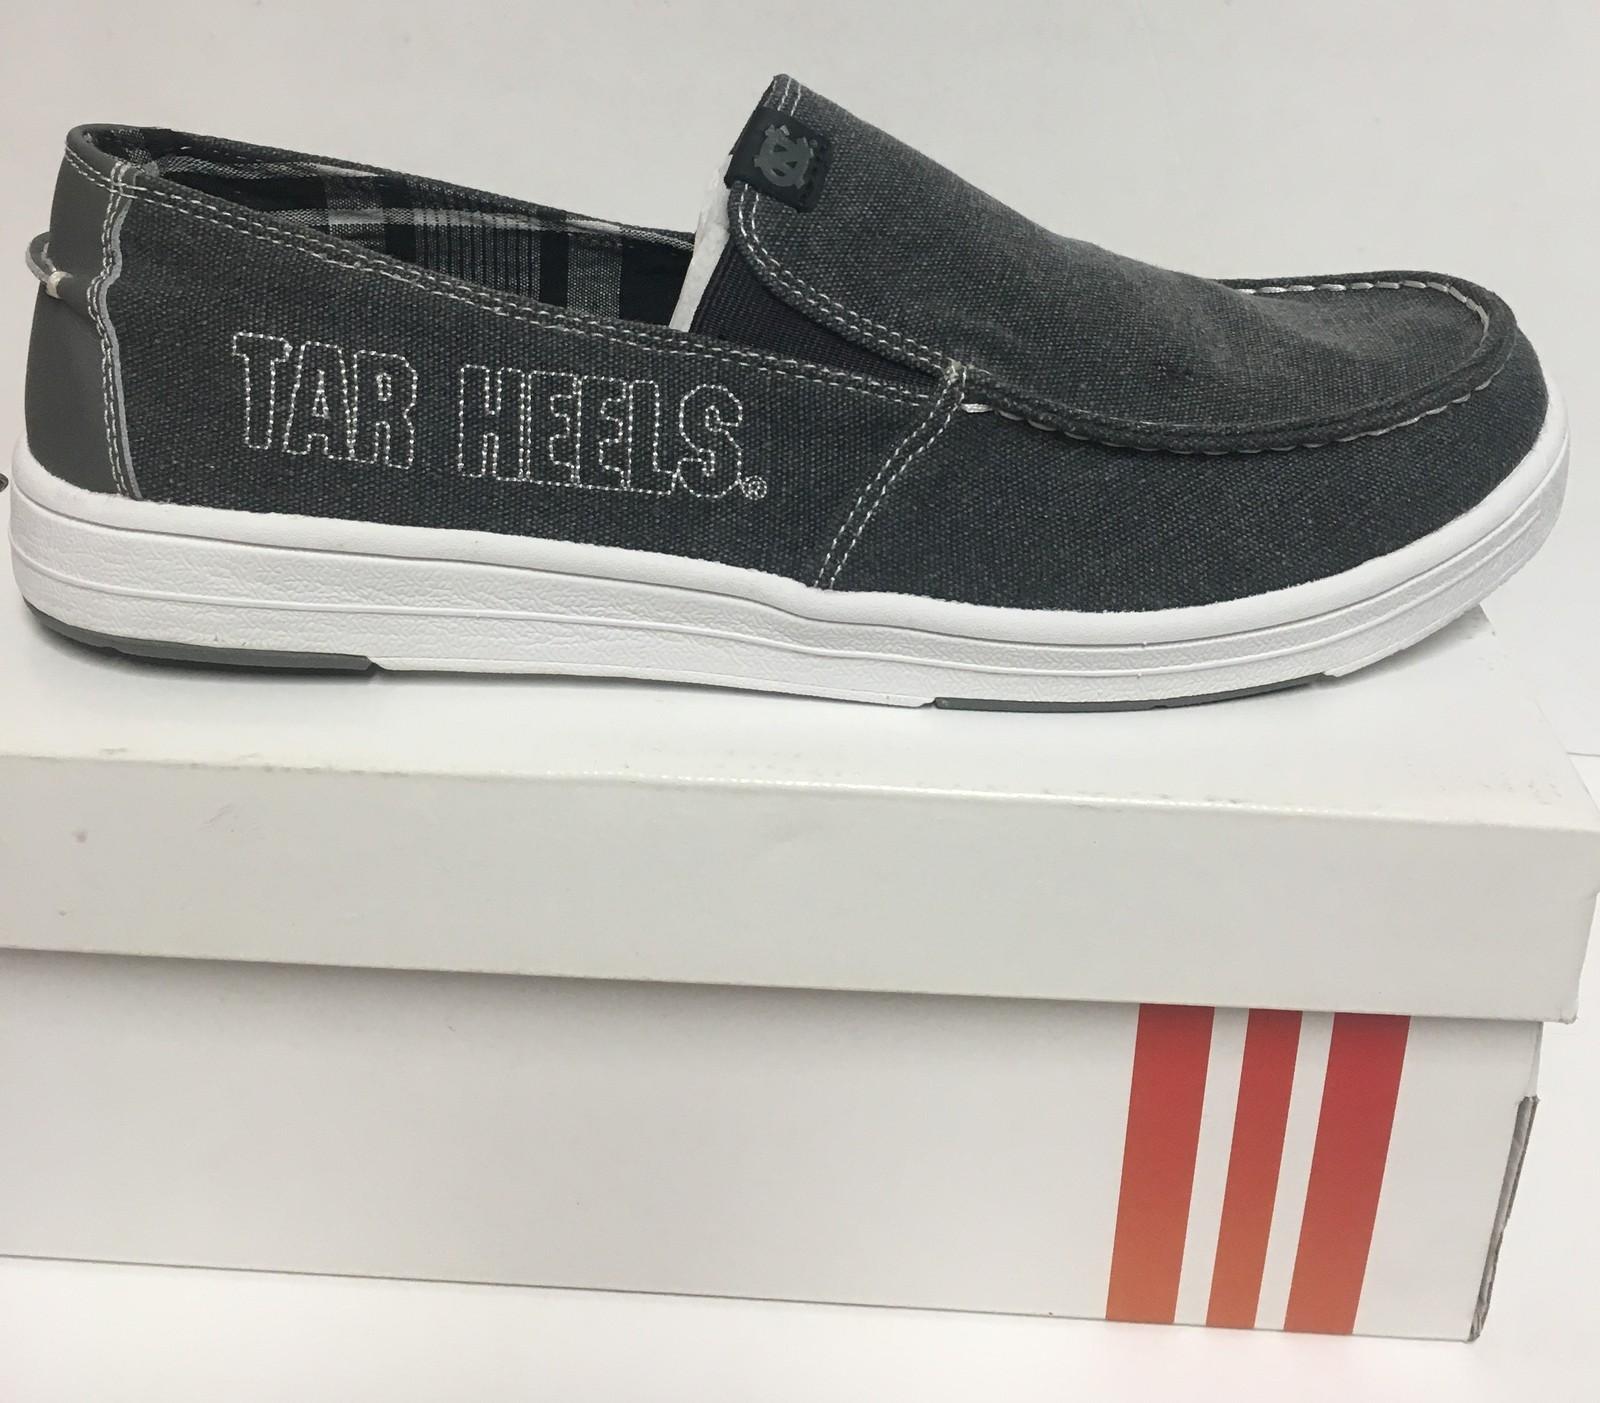 University of North Carolina Tar Heels Men's Team Shoes Gray Sz 12M